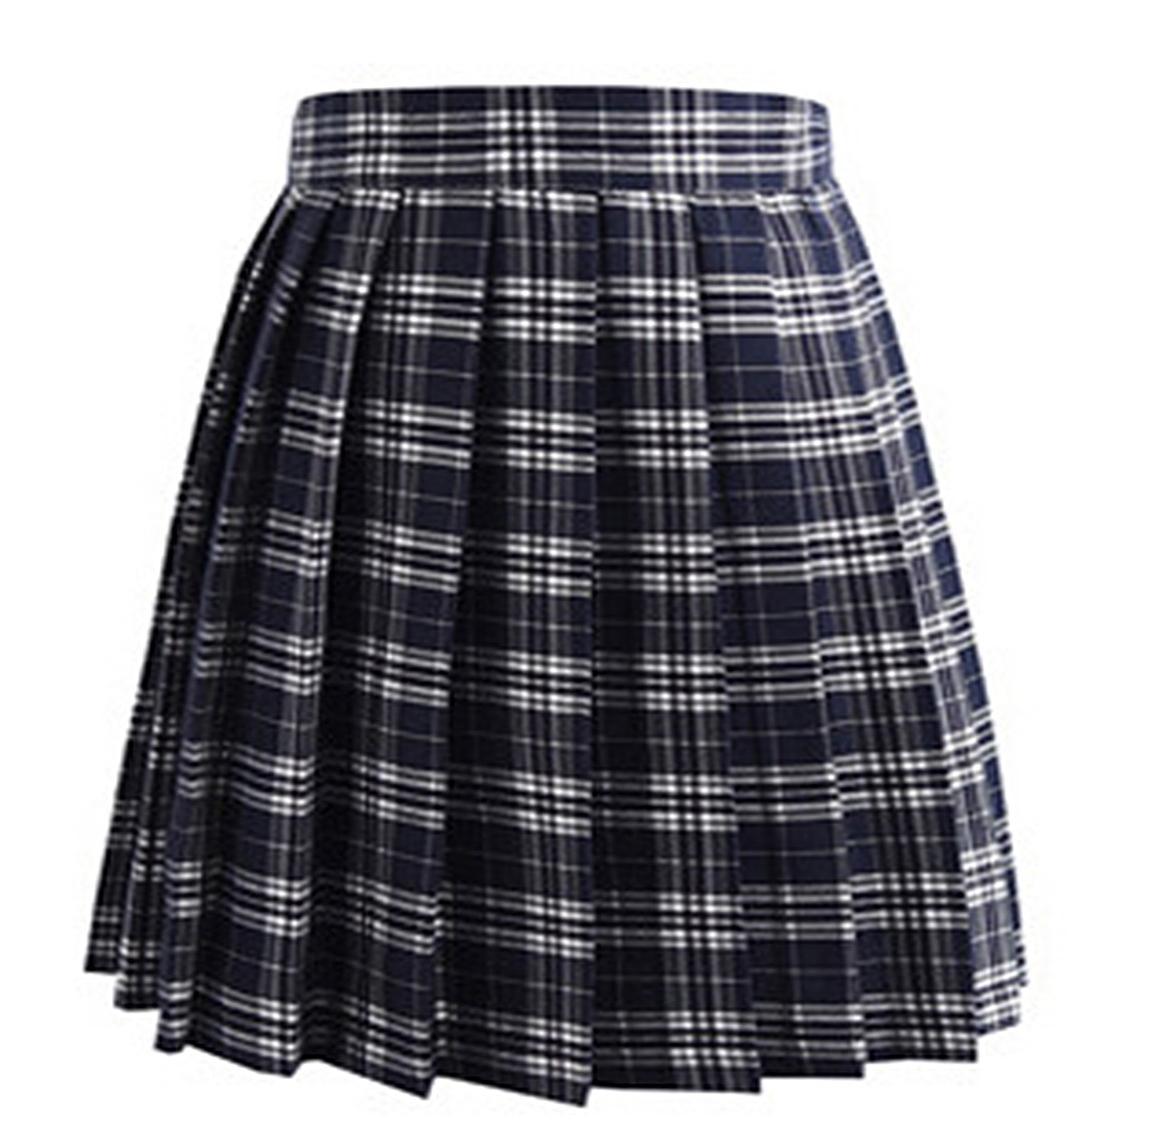 Check Pattern Uniform Cosplay Pleat Plaid Skirts Fashion Mini Homecoming Skirt A Line JK01 Party Cocktail Dress Knee Length Girls Dresses